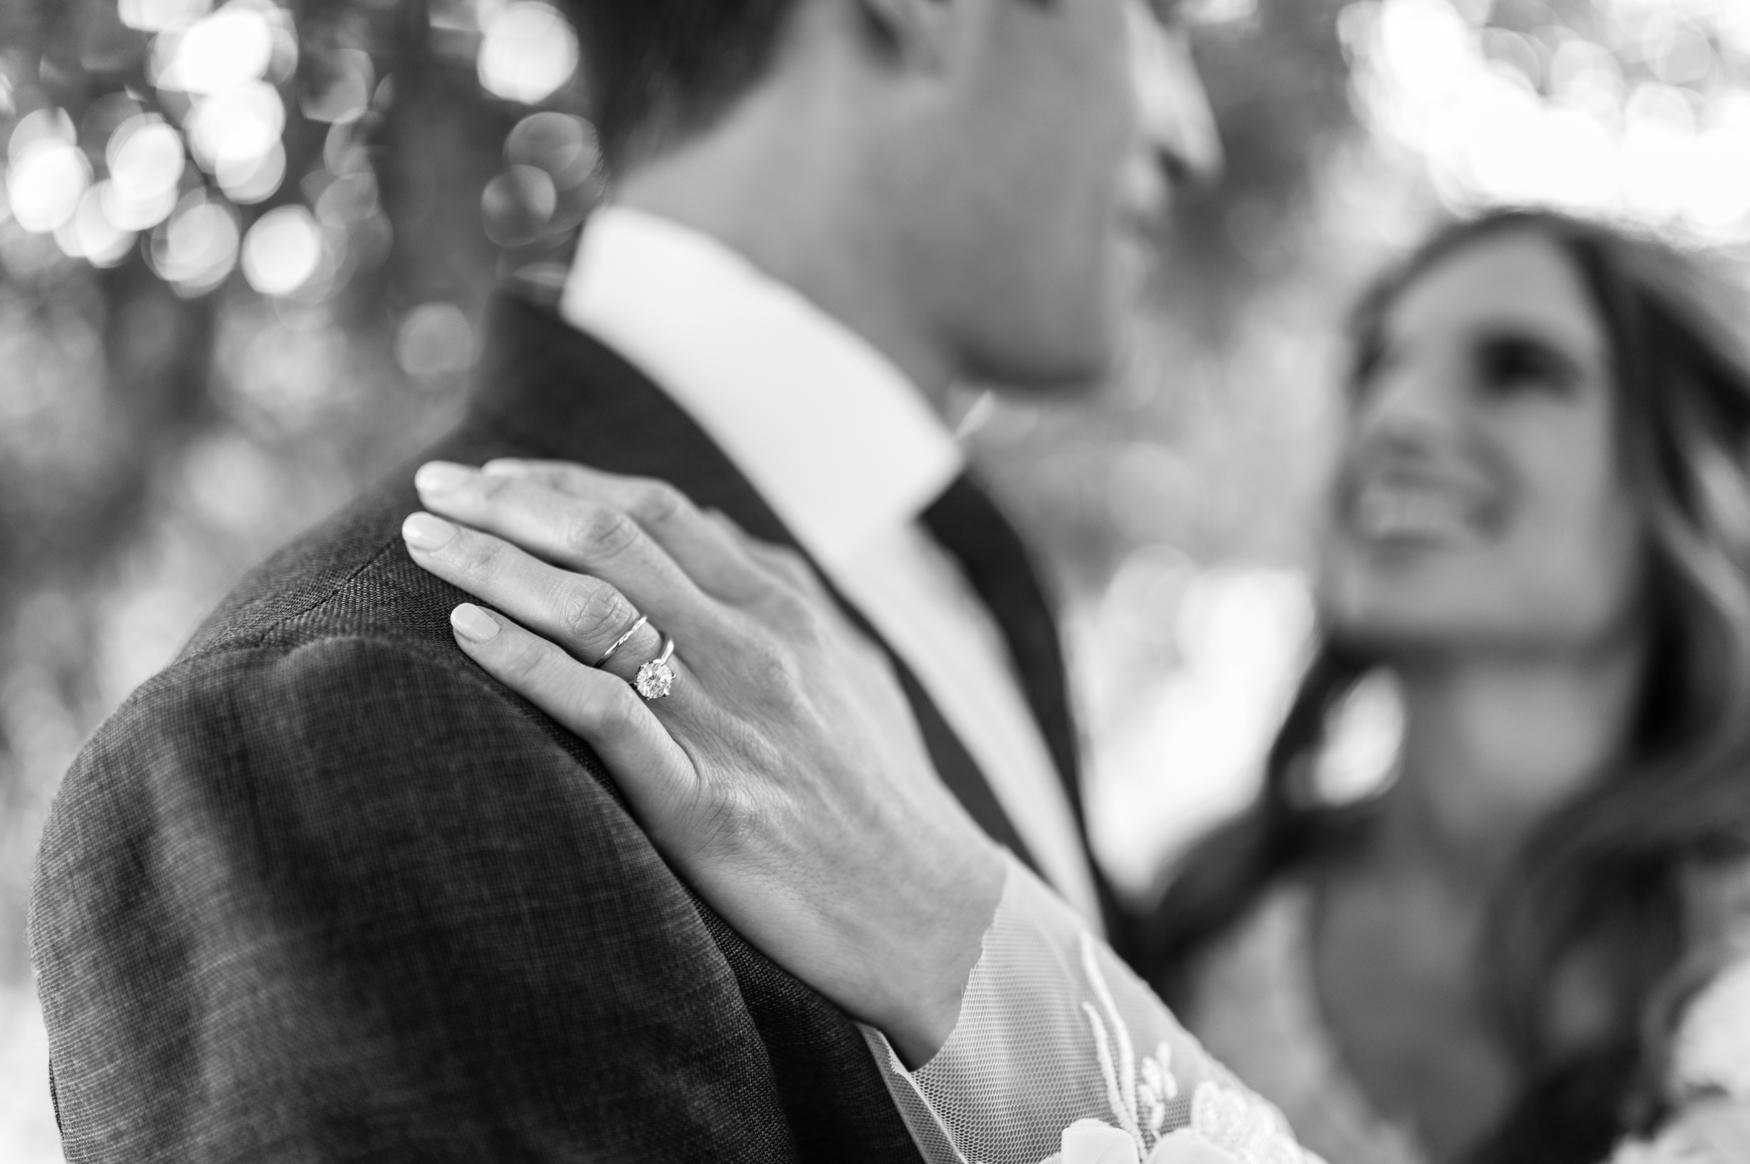 Leon_&_Martine's_Wedding_Photographs_17th_April_2019_@johnhenryweddingphoto_Low_Resolution_Web-387.JPG